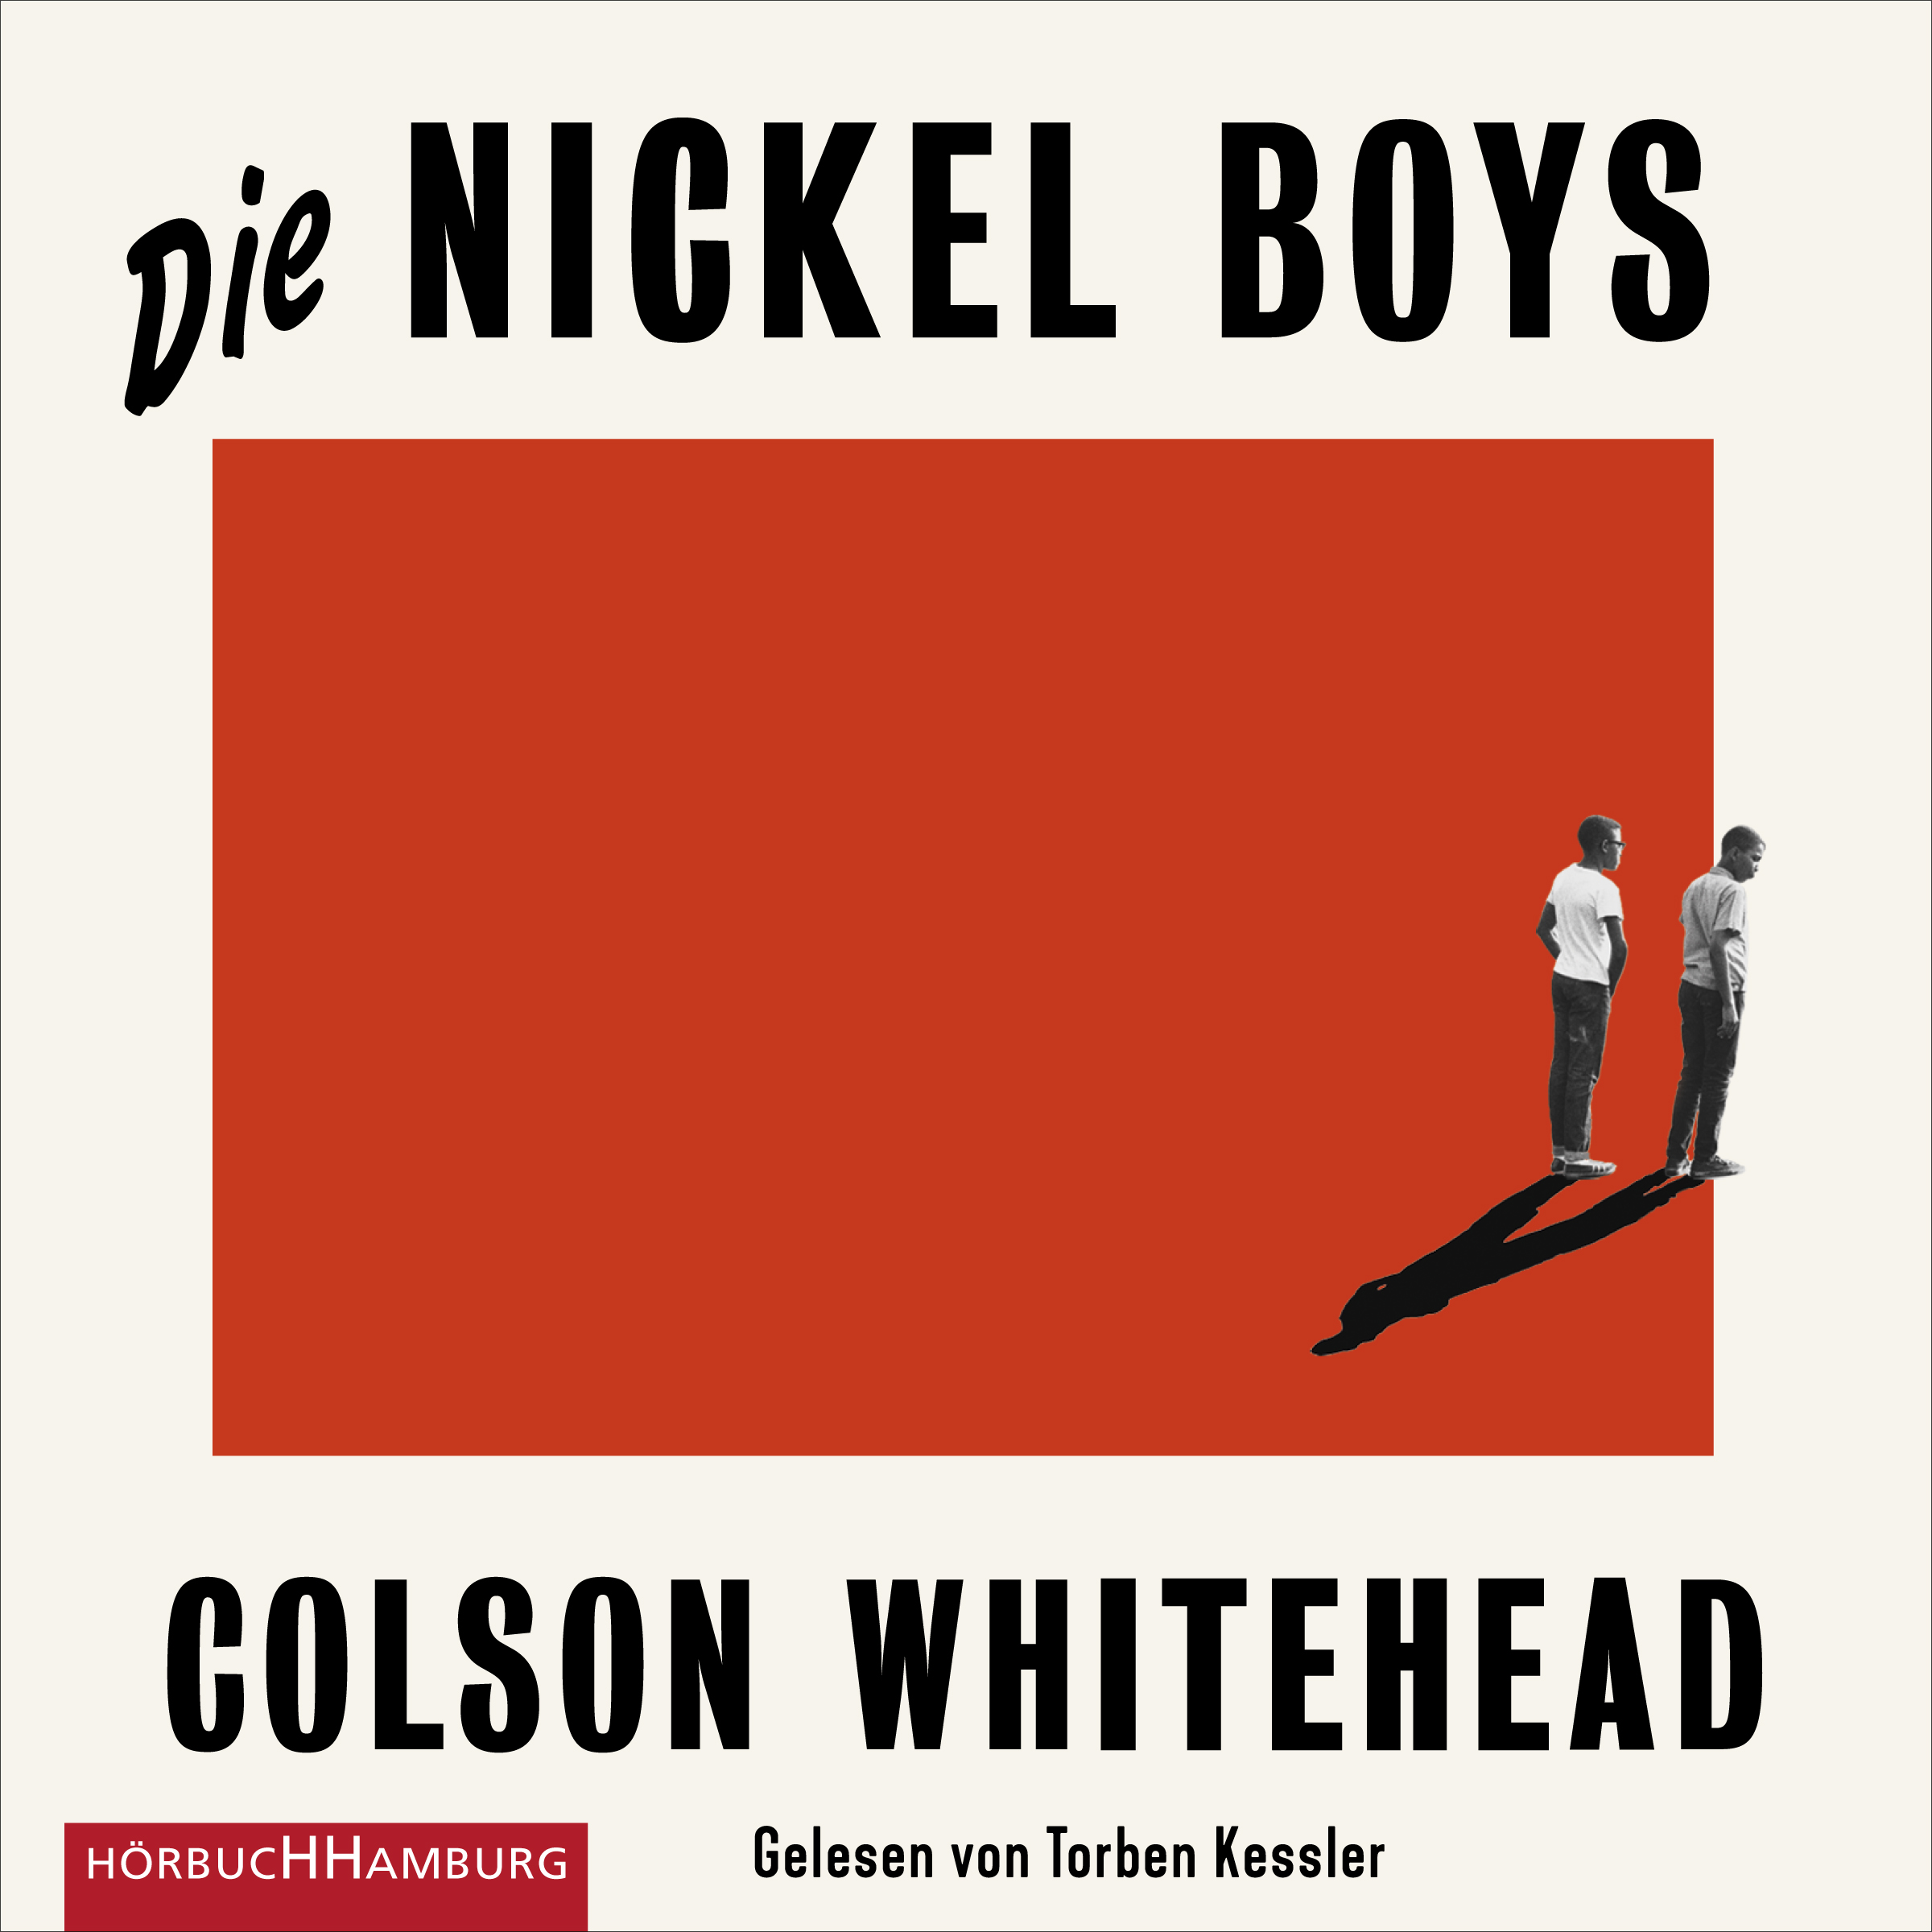 Cover für das Die Nickel Boys Hörbuch